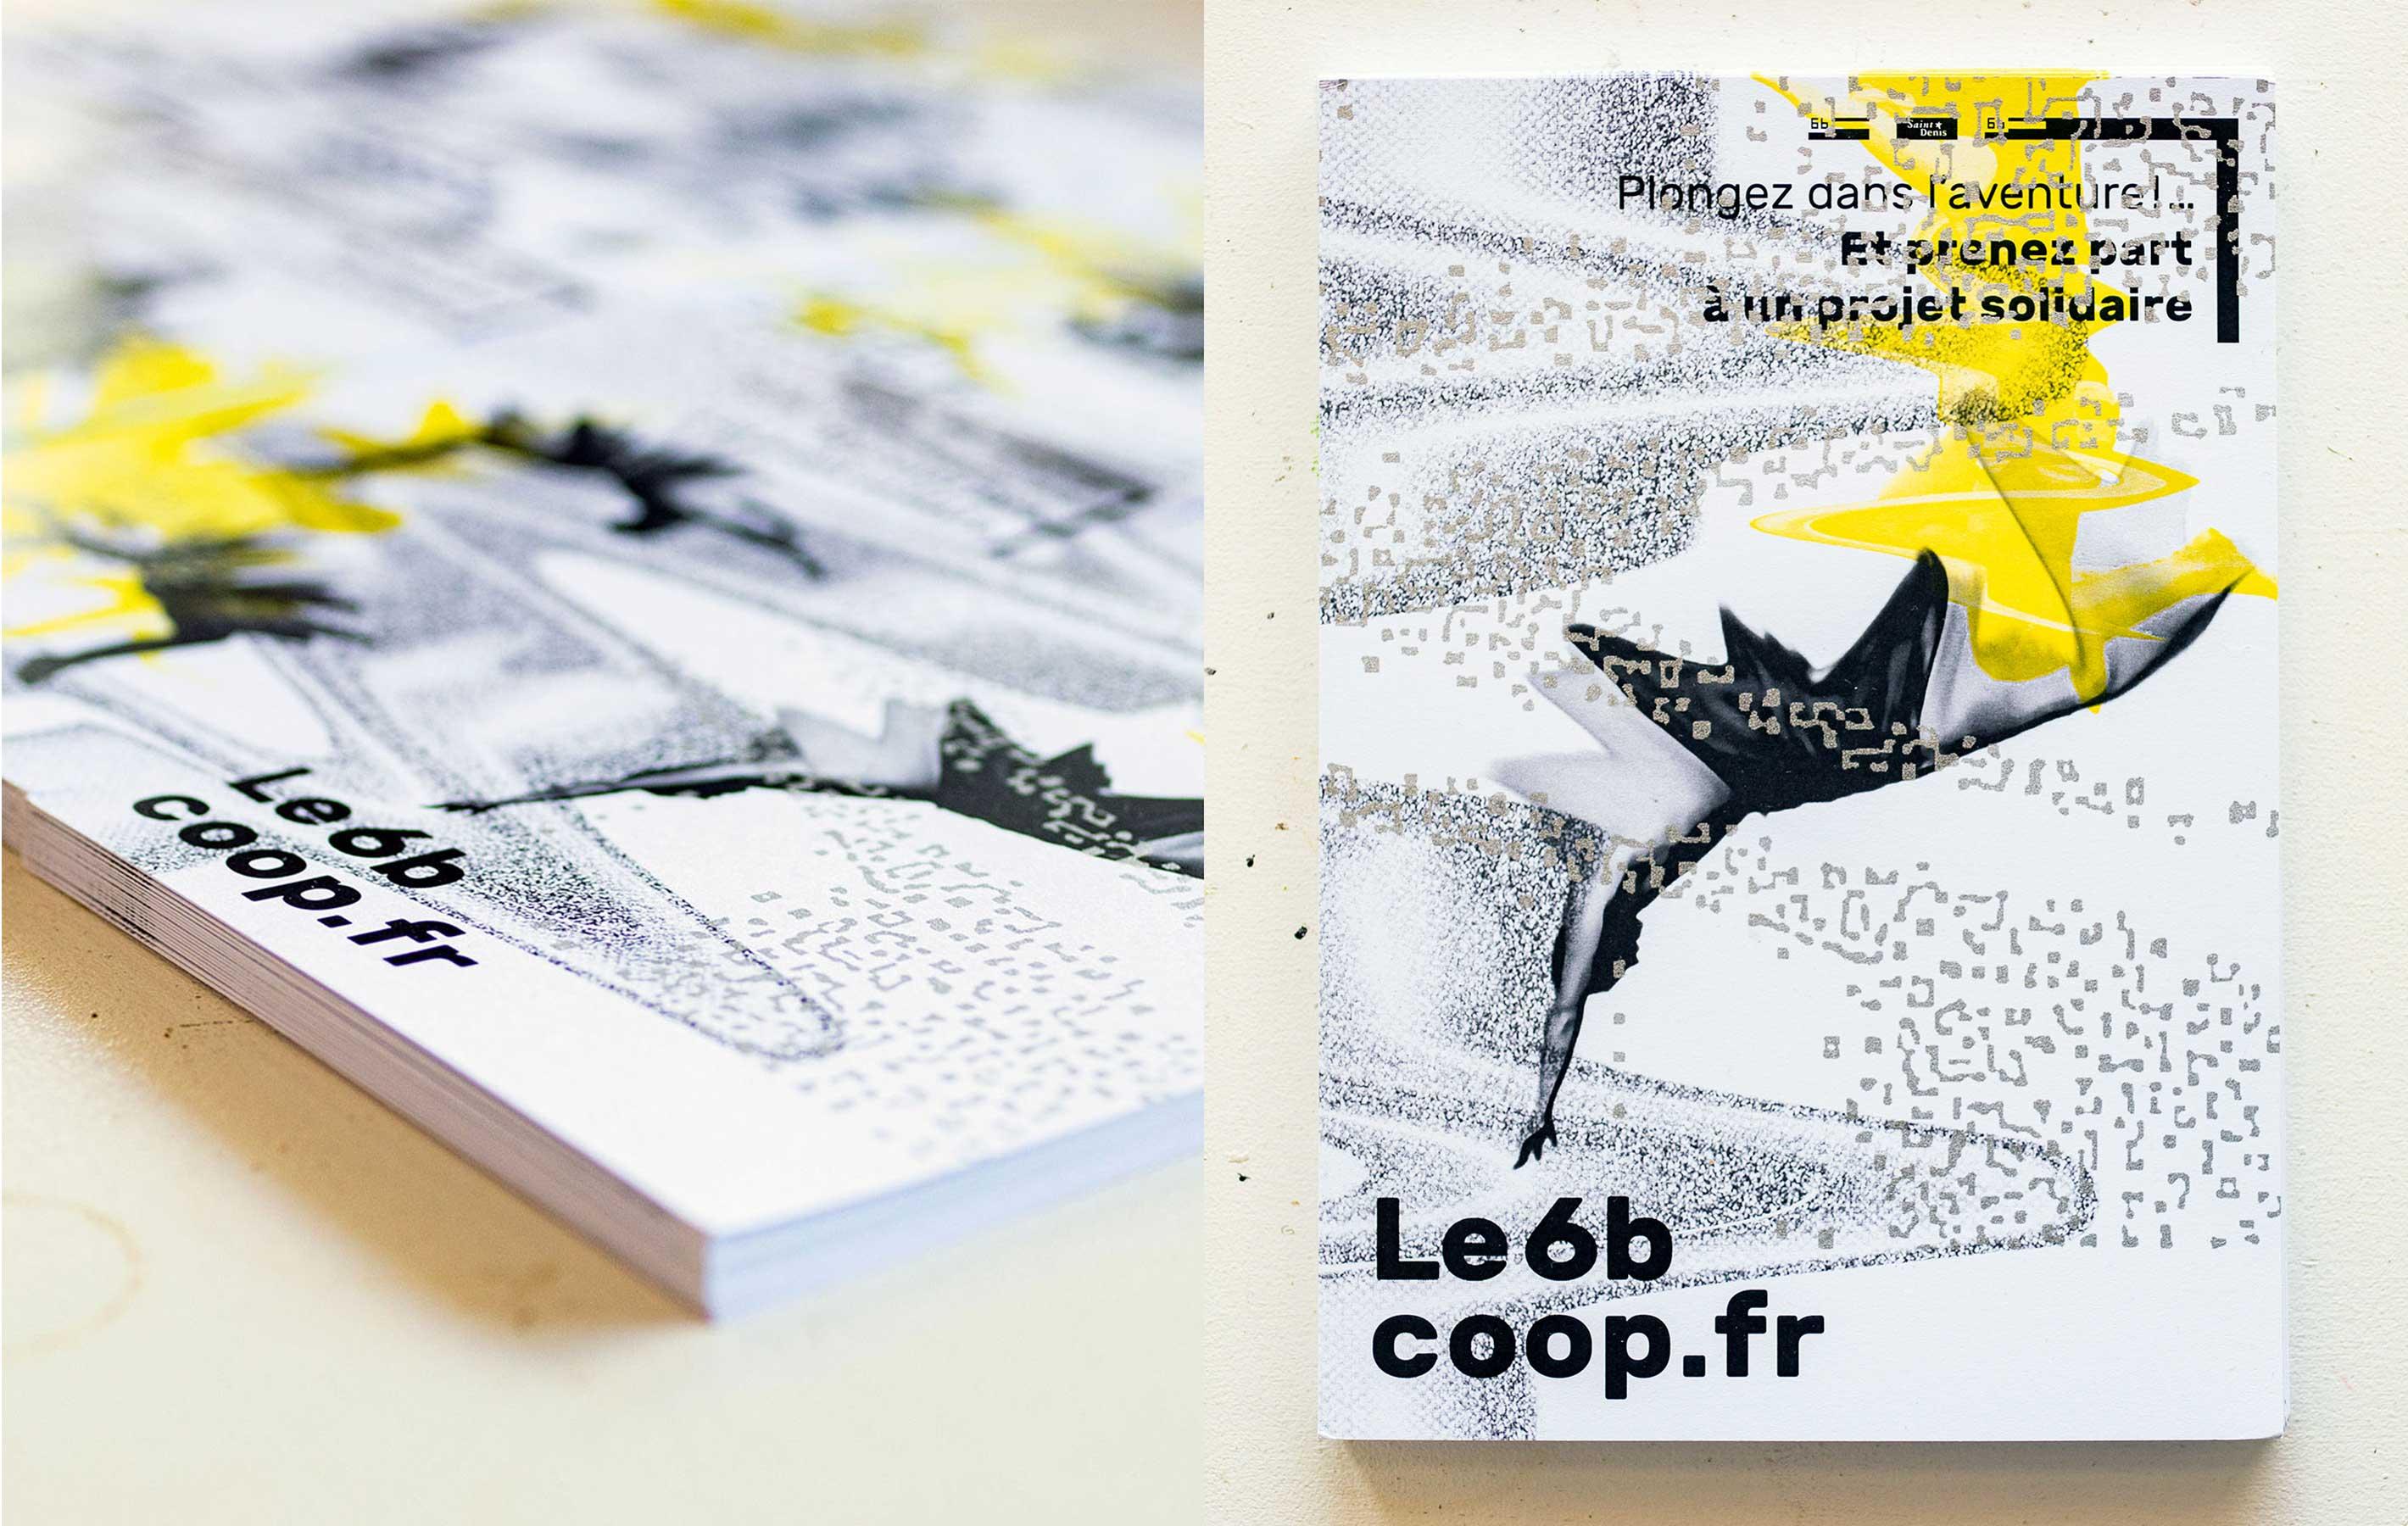 6b coop